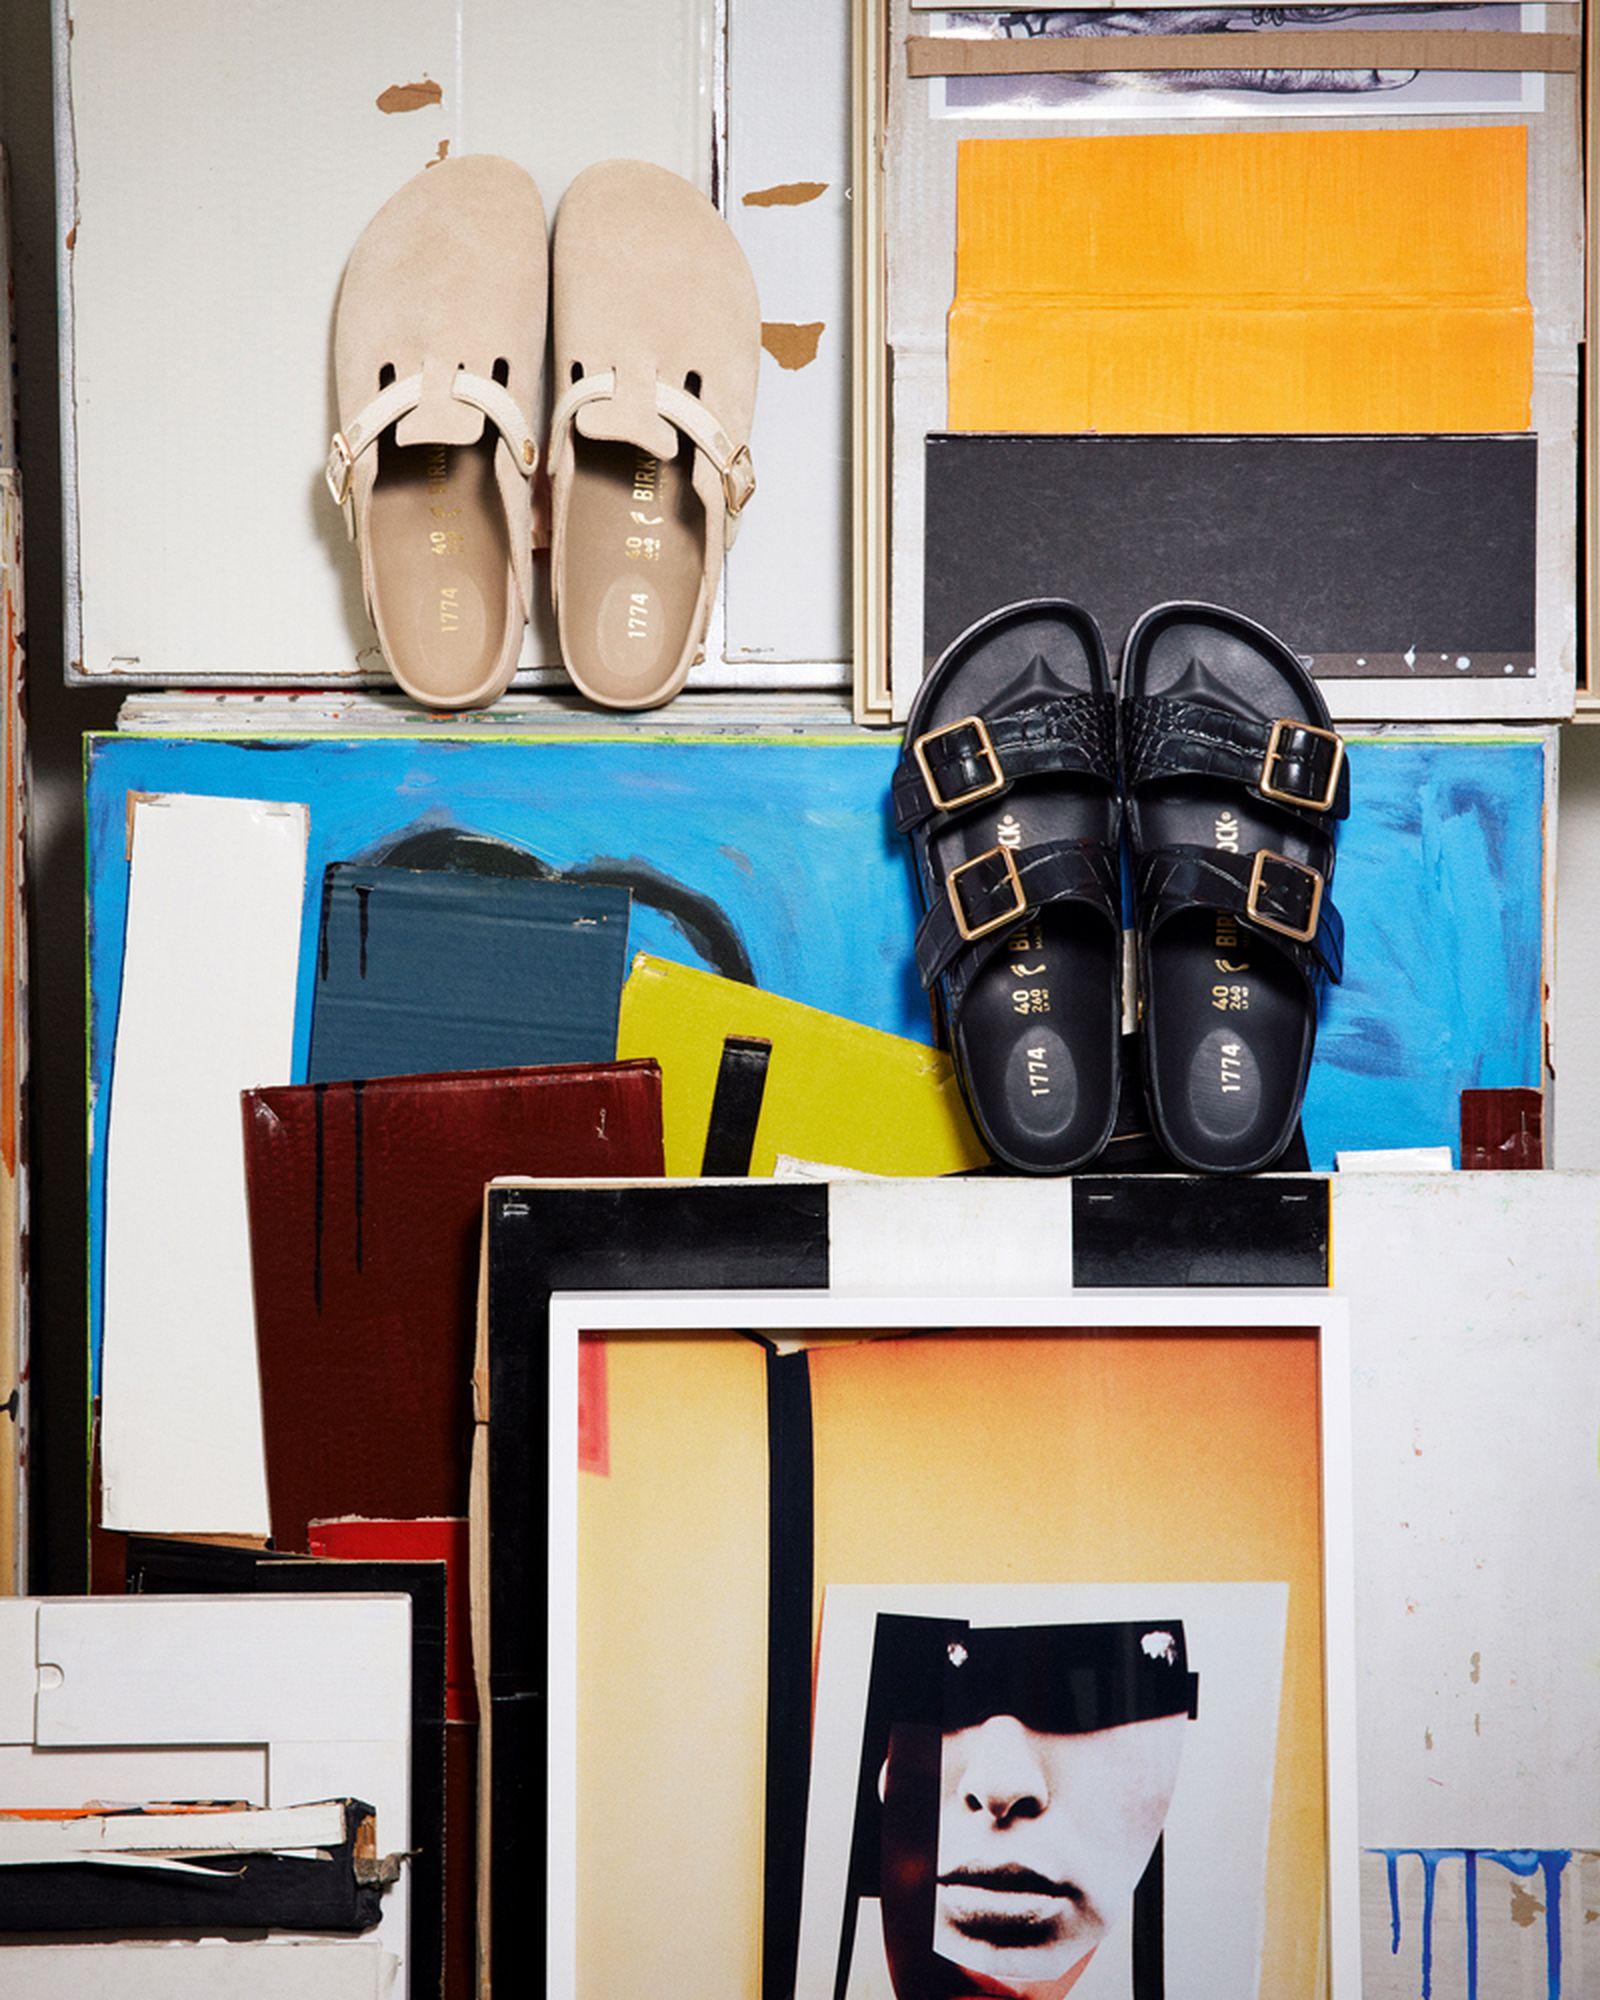 birkenstock 1774 croc arizona pattern print leather boston sandal release date info buy shoe collection fw21 fall winter 2021 drop